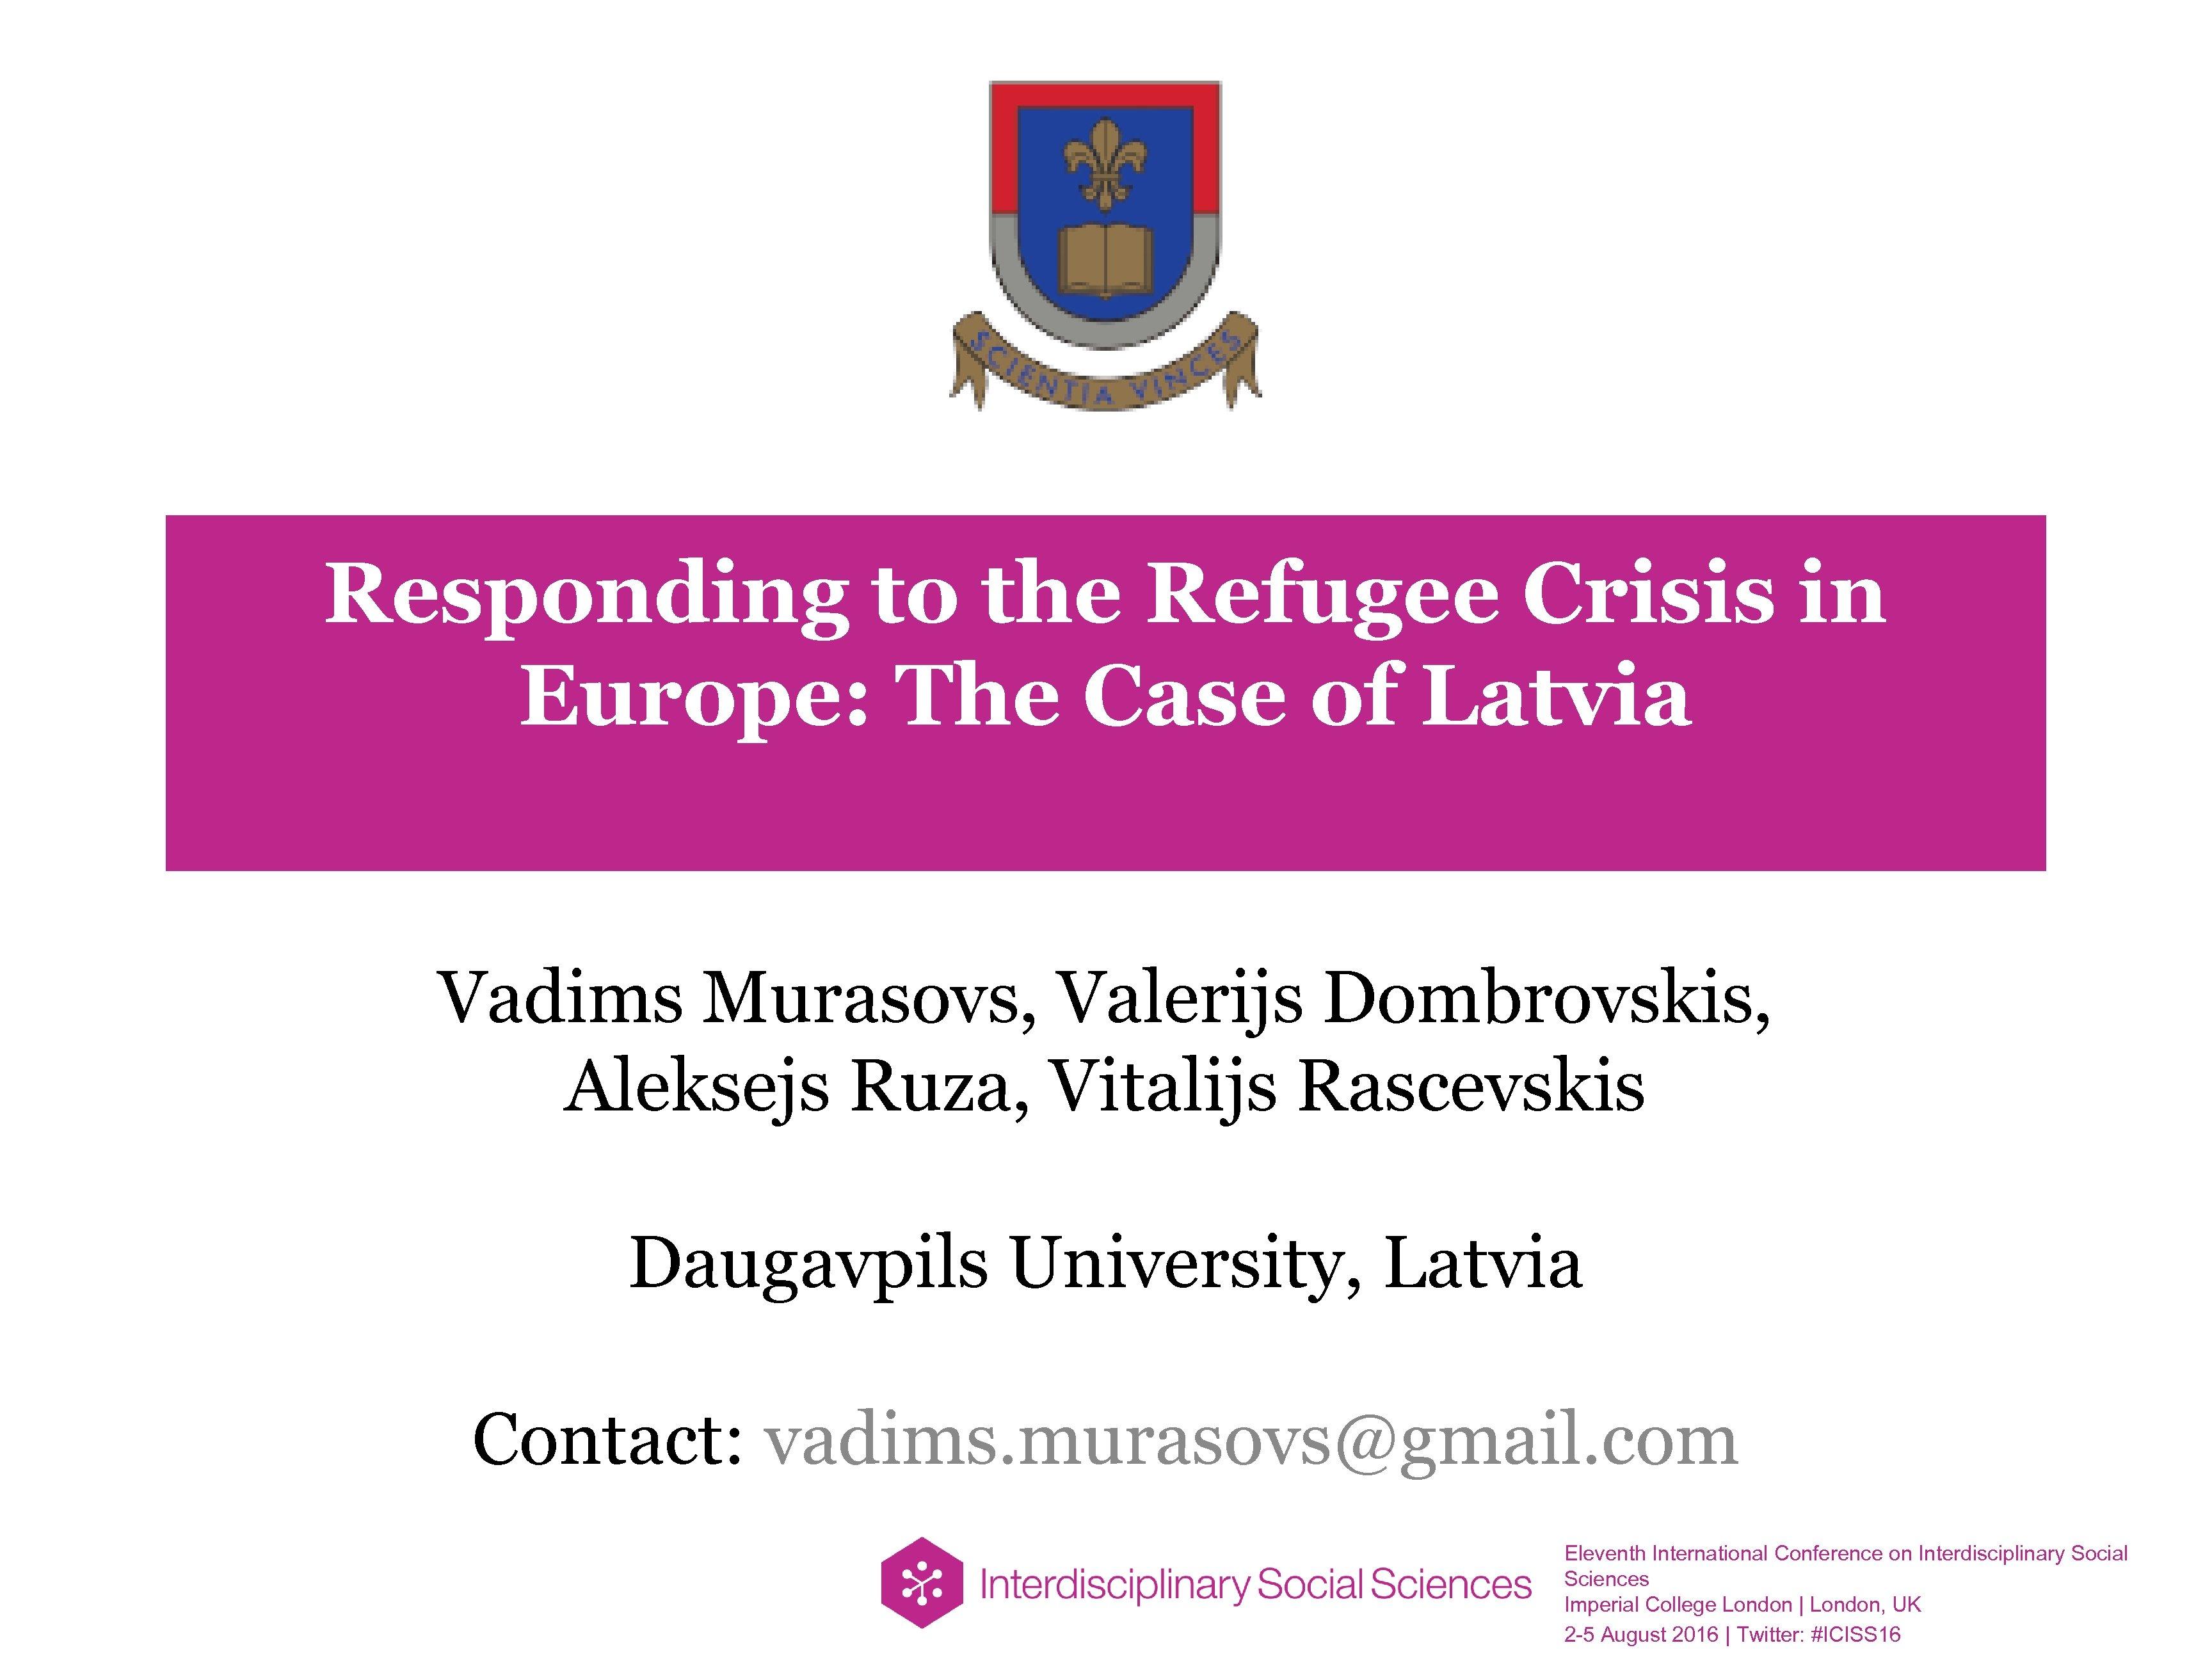 Responding to the Refugee Crisis in Europe: The Case of Latvia Vadims Murasovs, Valerijs